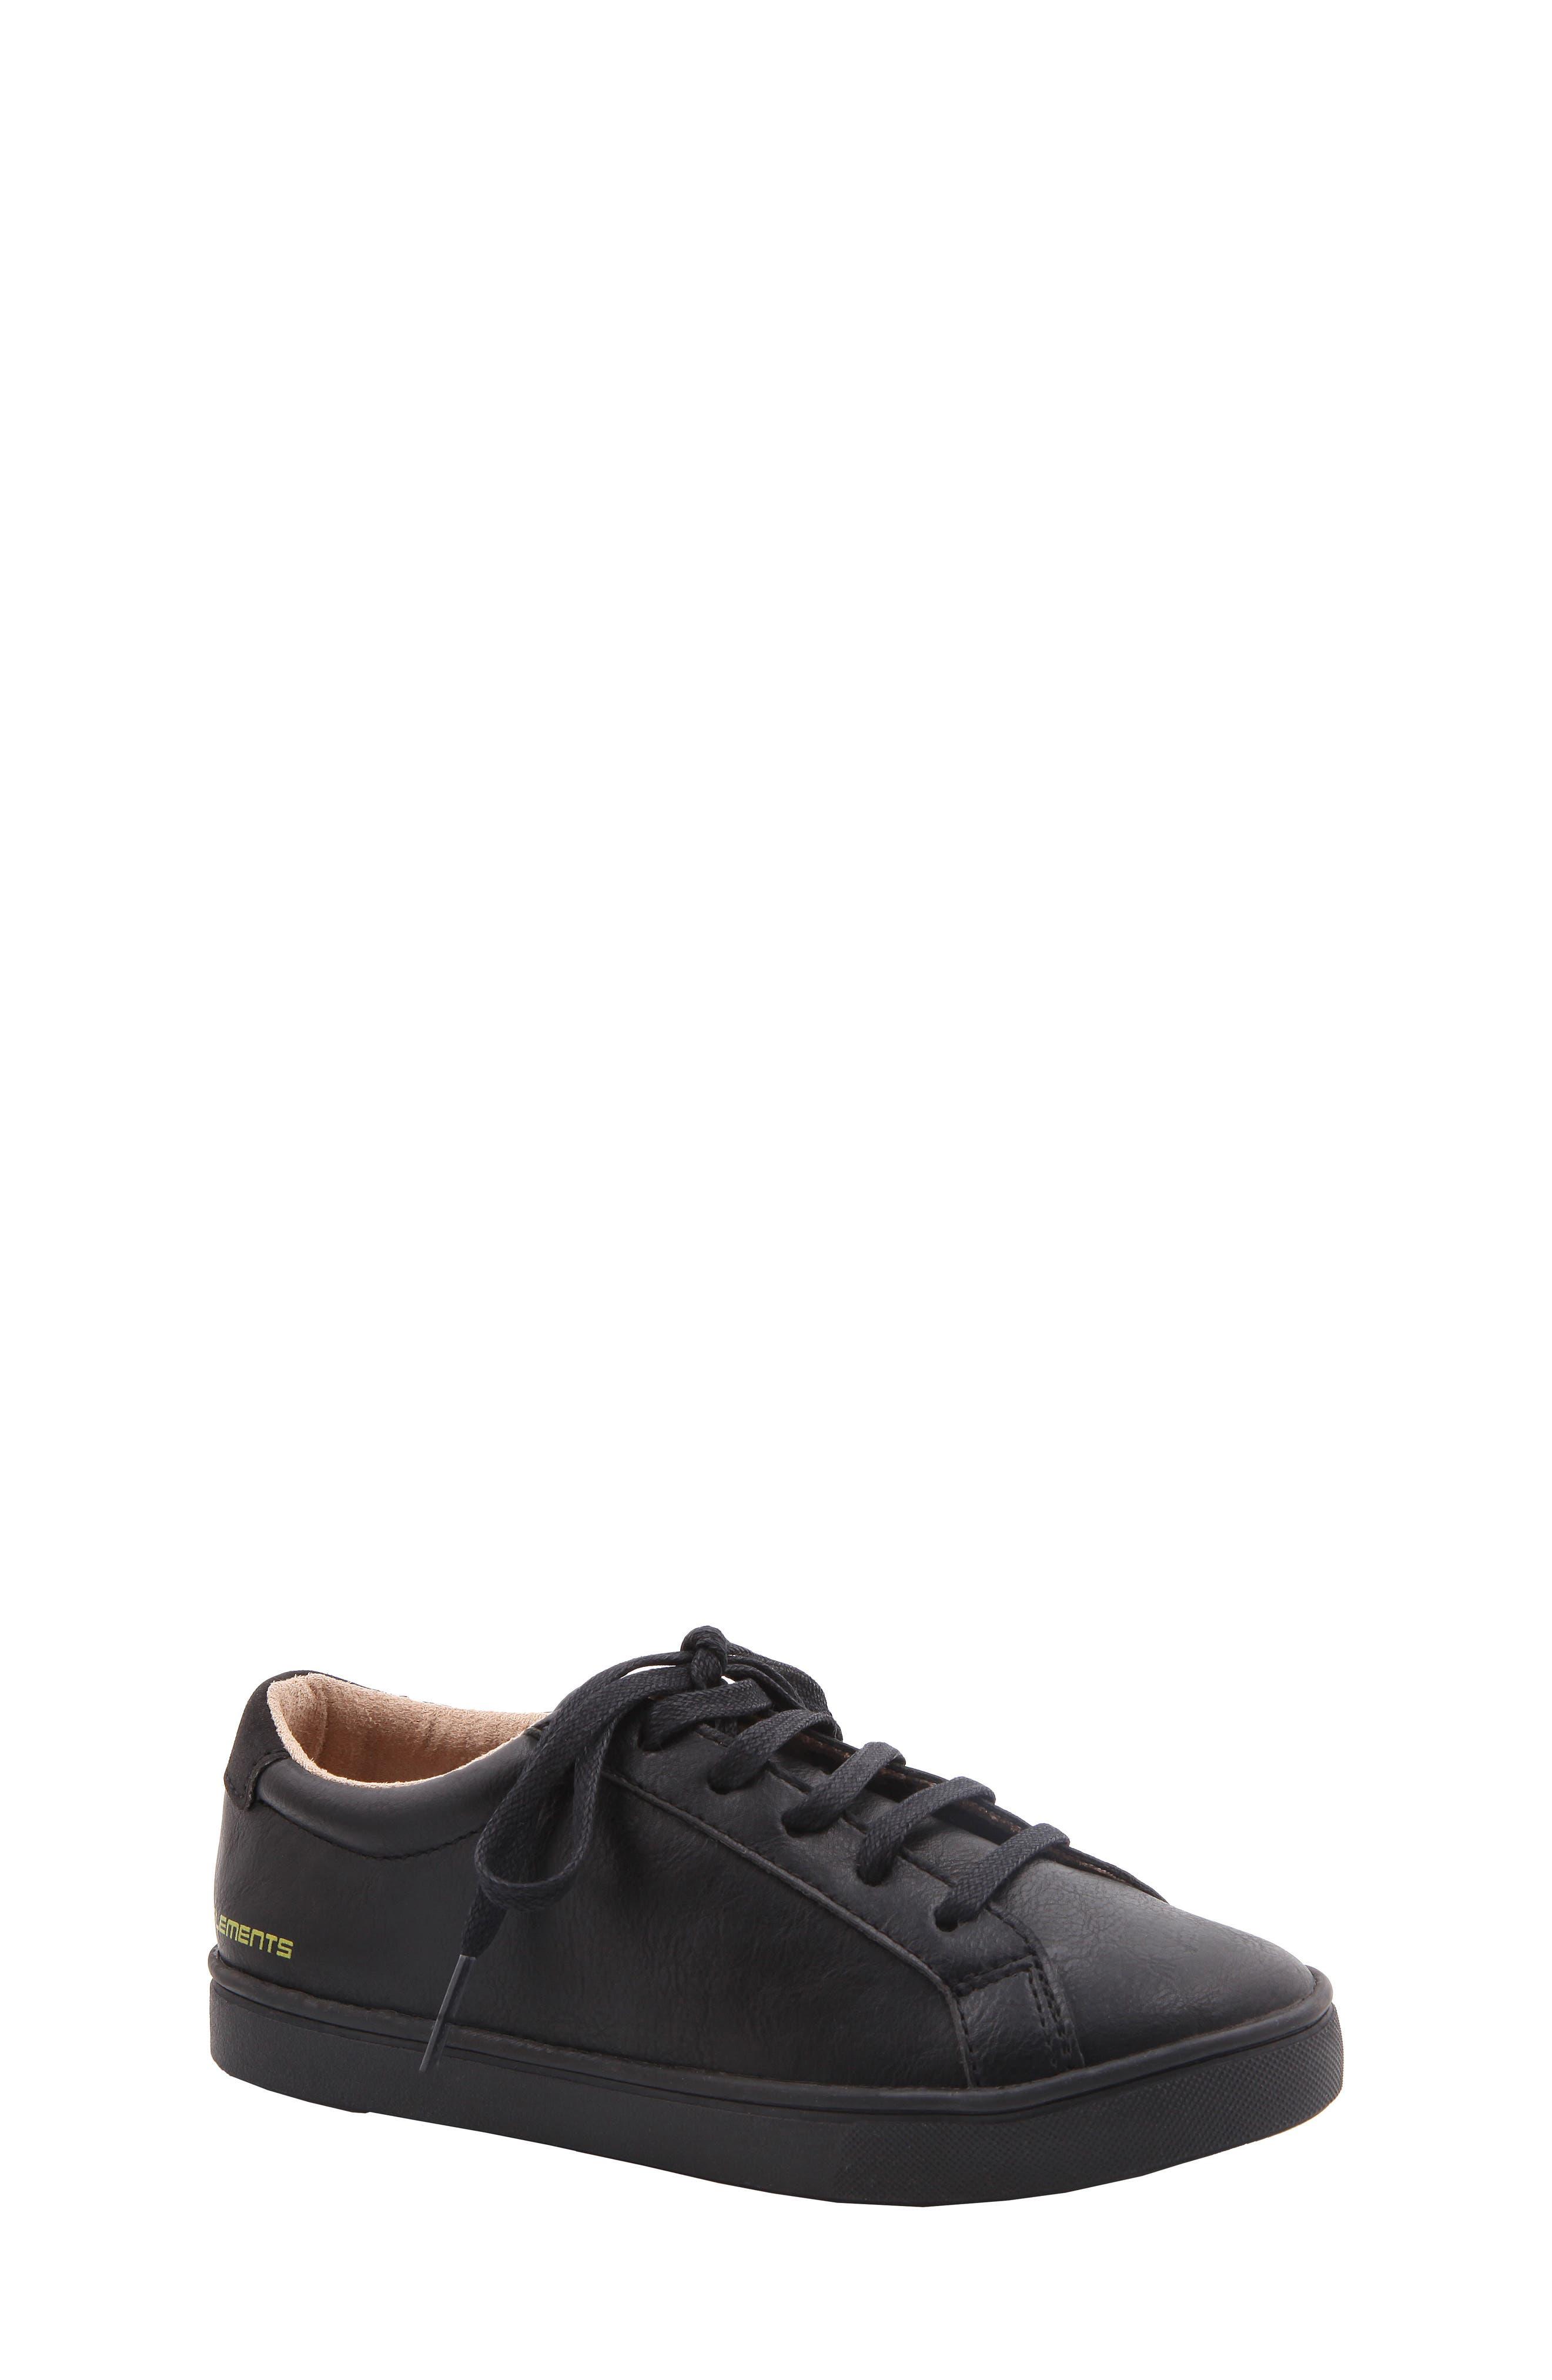 Chaz Sneaker,                             Main thumbnail 1, color,                             003